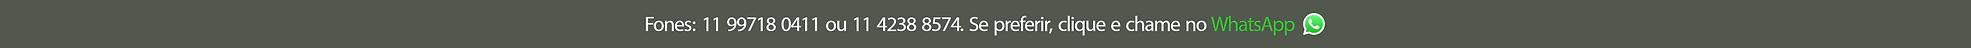 header site novo DELIMA.png